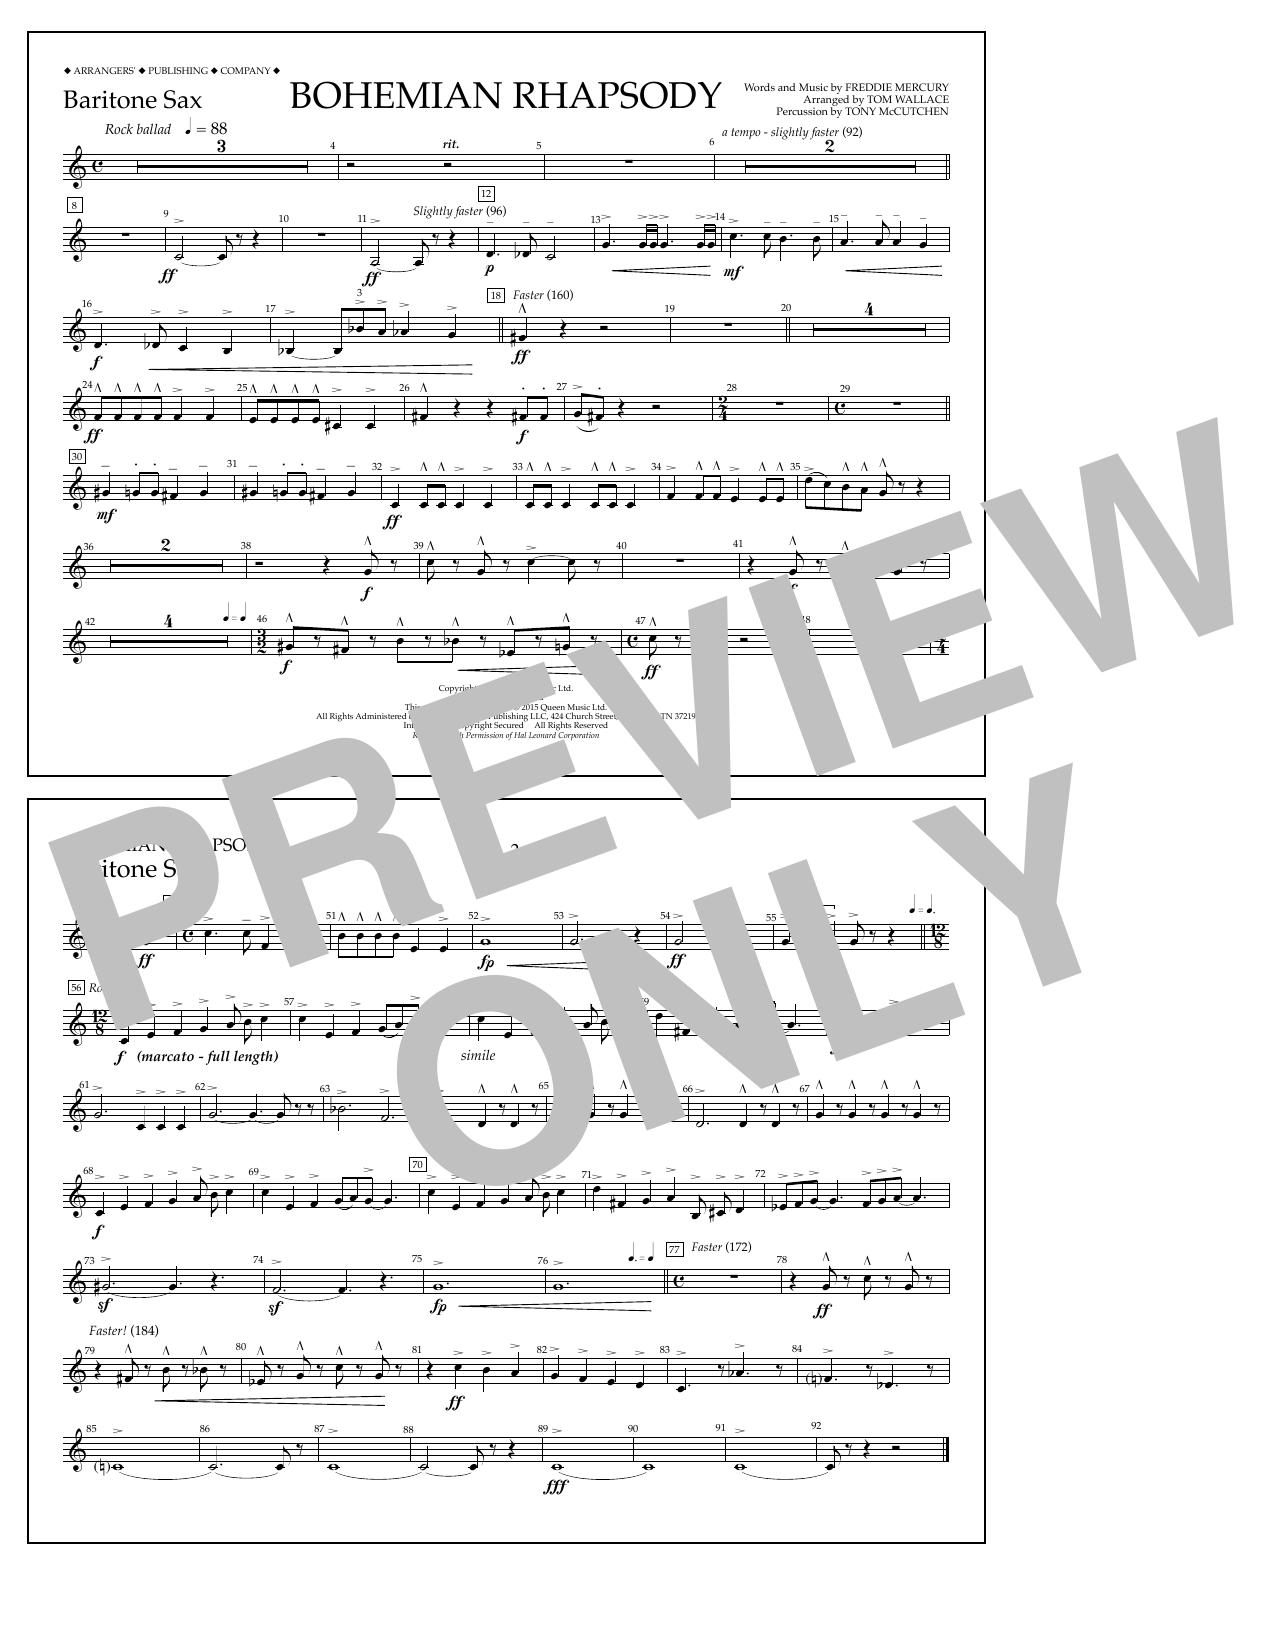 Tom Wallace Bohemian Rhapsody - Baritone Sax sheet music notes and chords. Download Printable PDF.